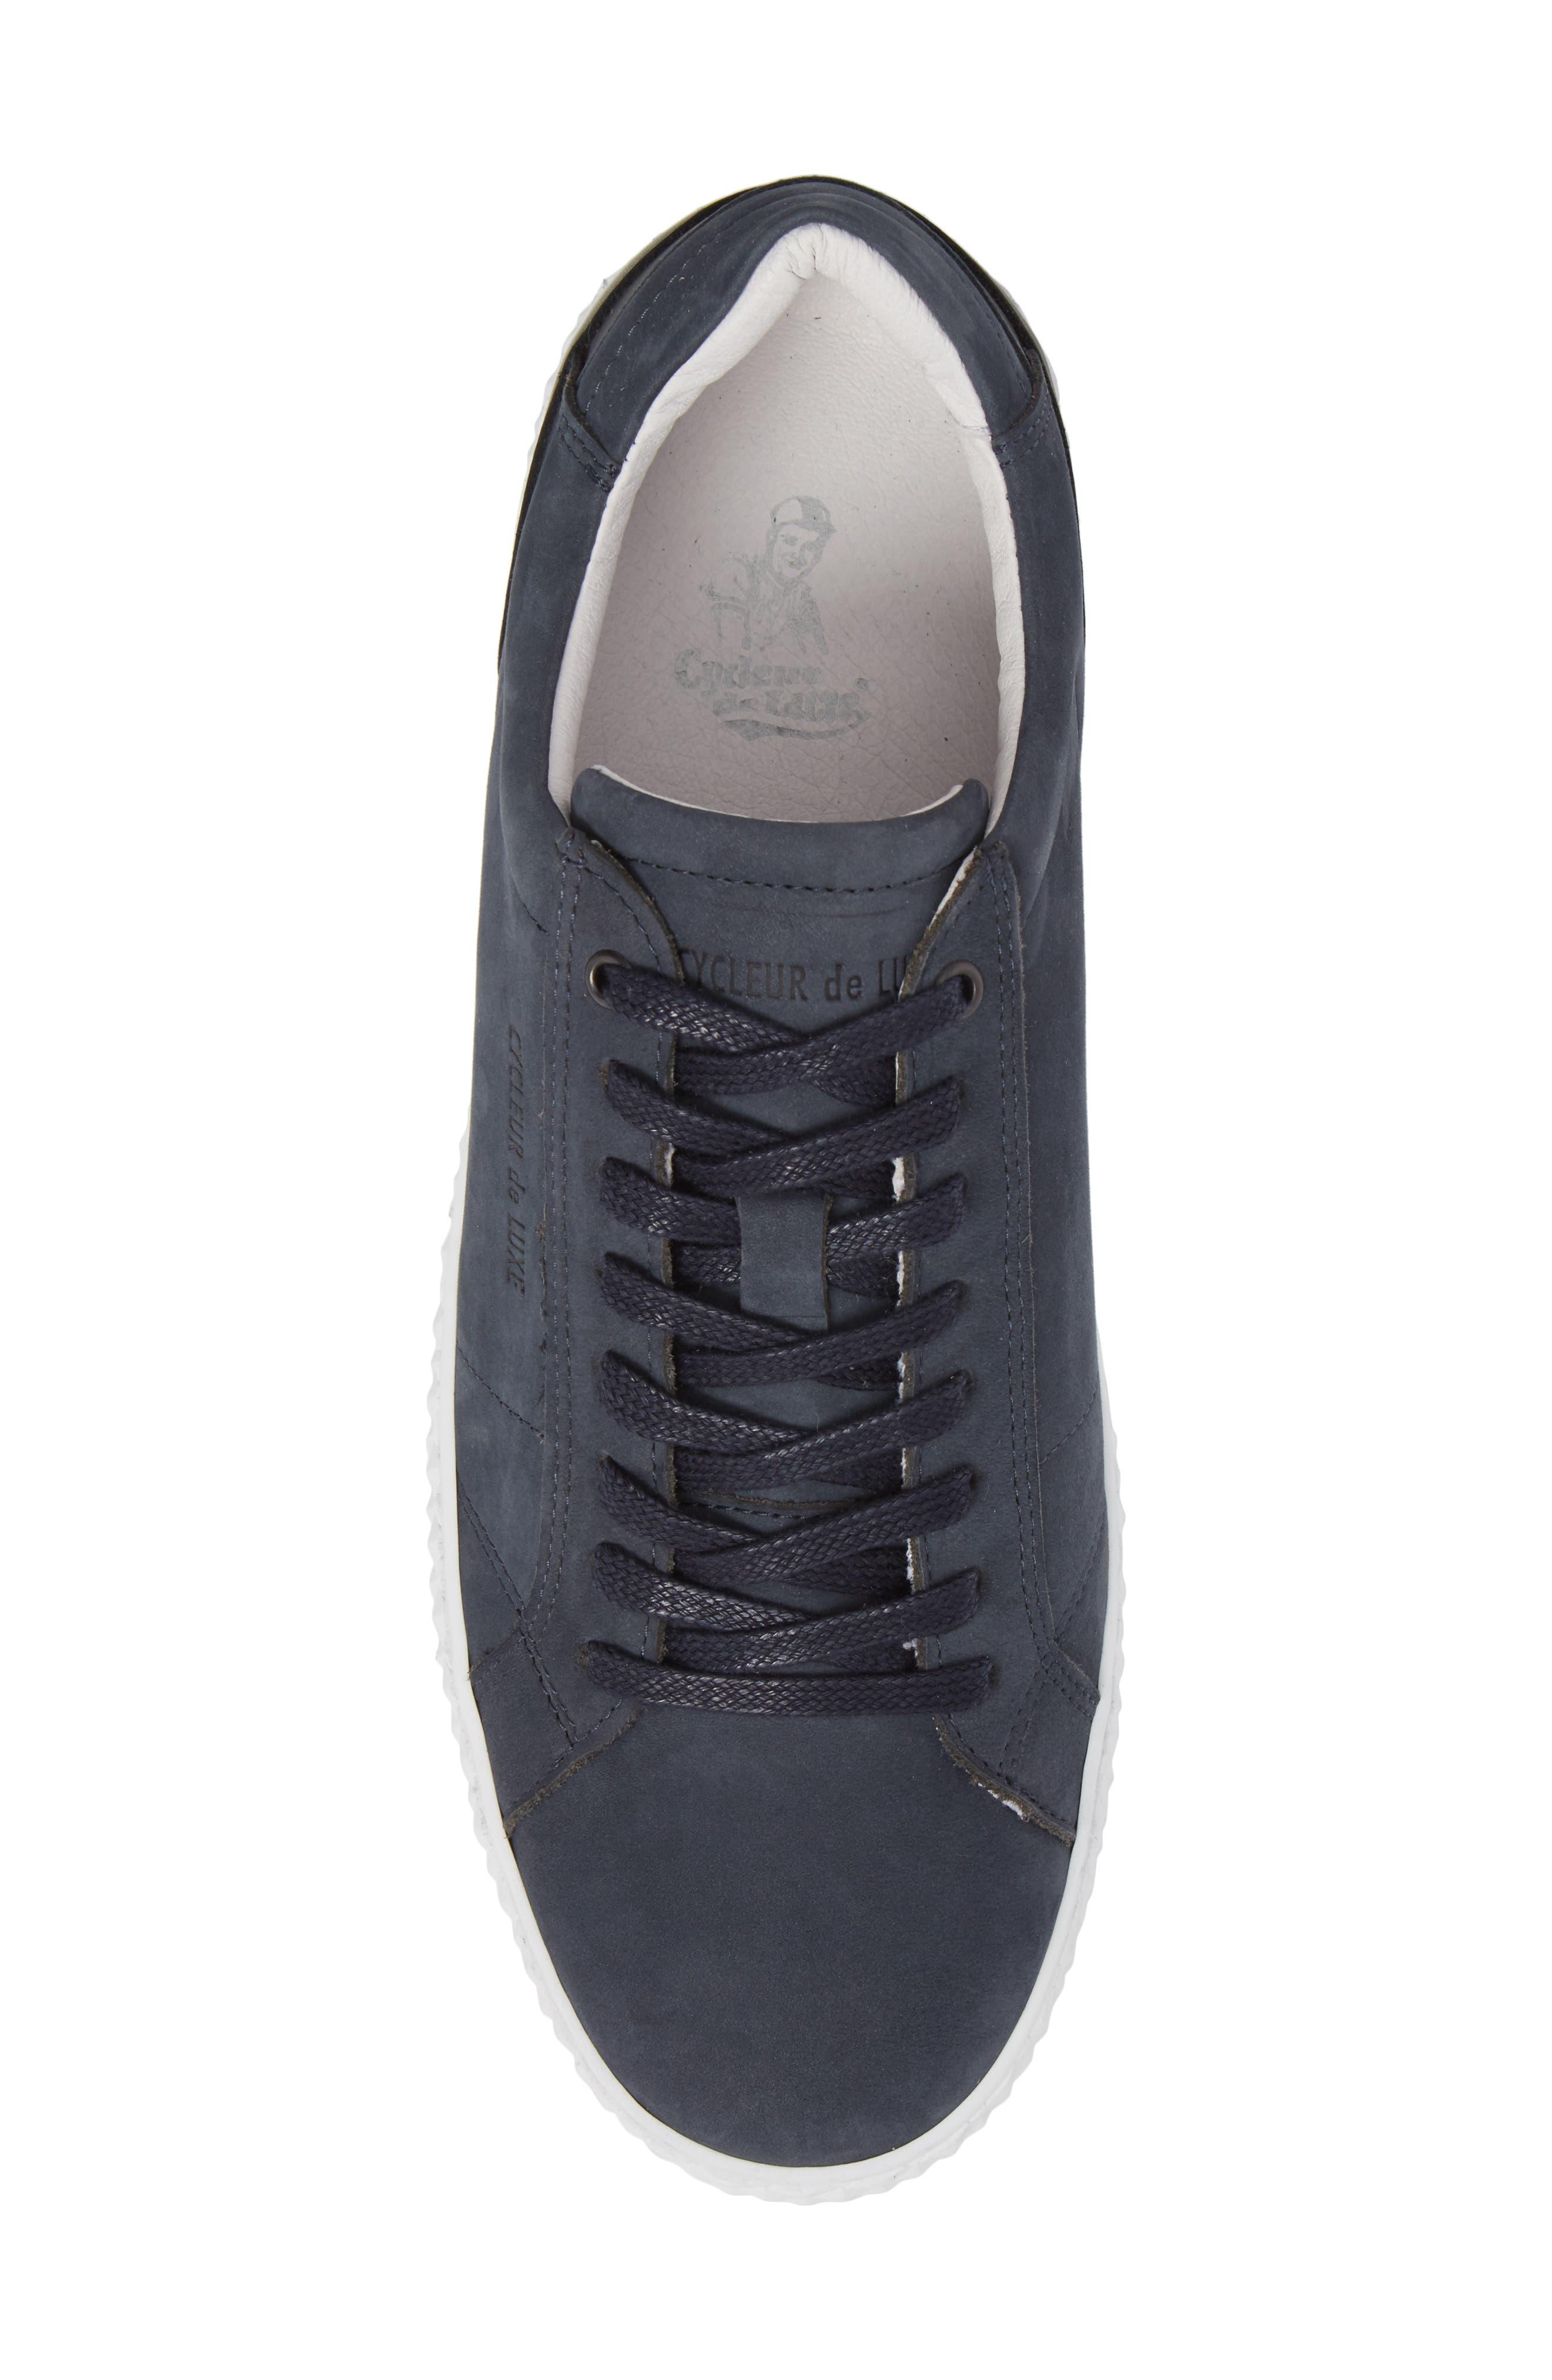 Bratislava Low Top Sneaker,                             Alternate thumbnail 5, color,                             Navy Leather